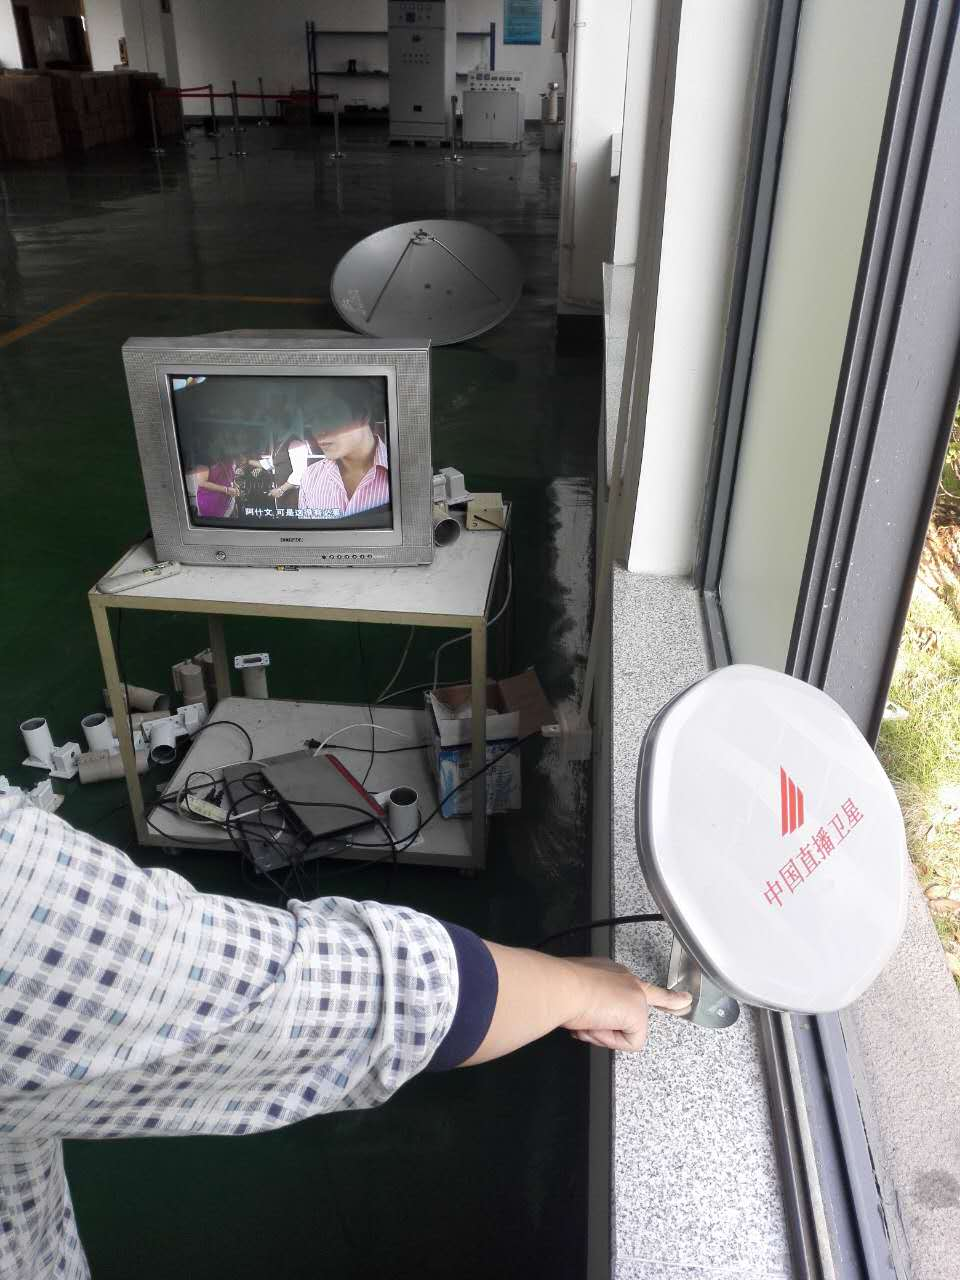 digital tv 26cm ku band lnb in mini satellite dish antenna